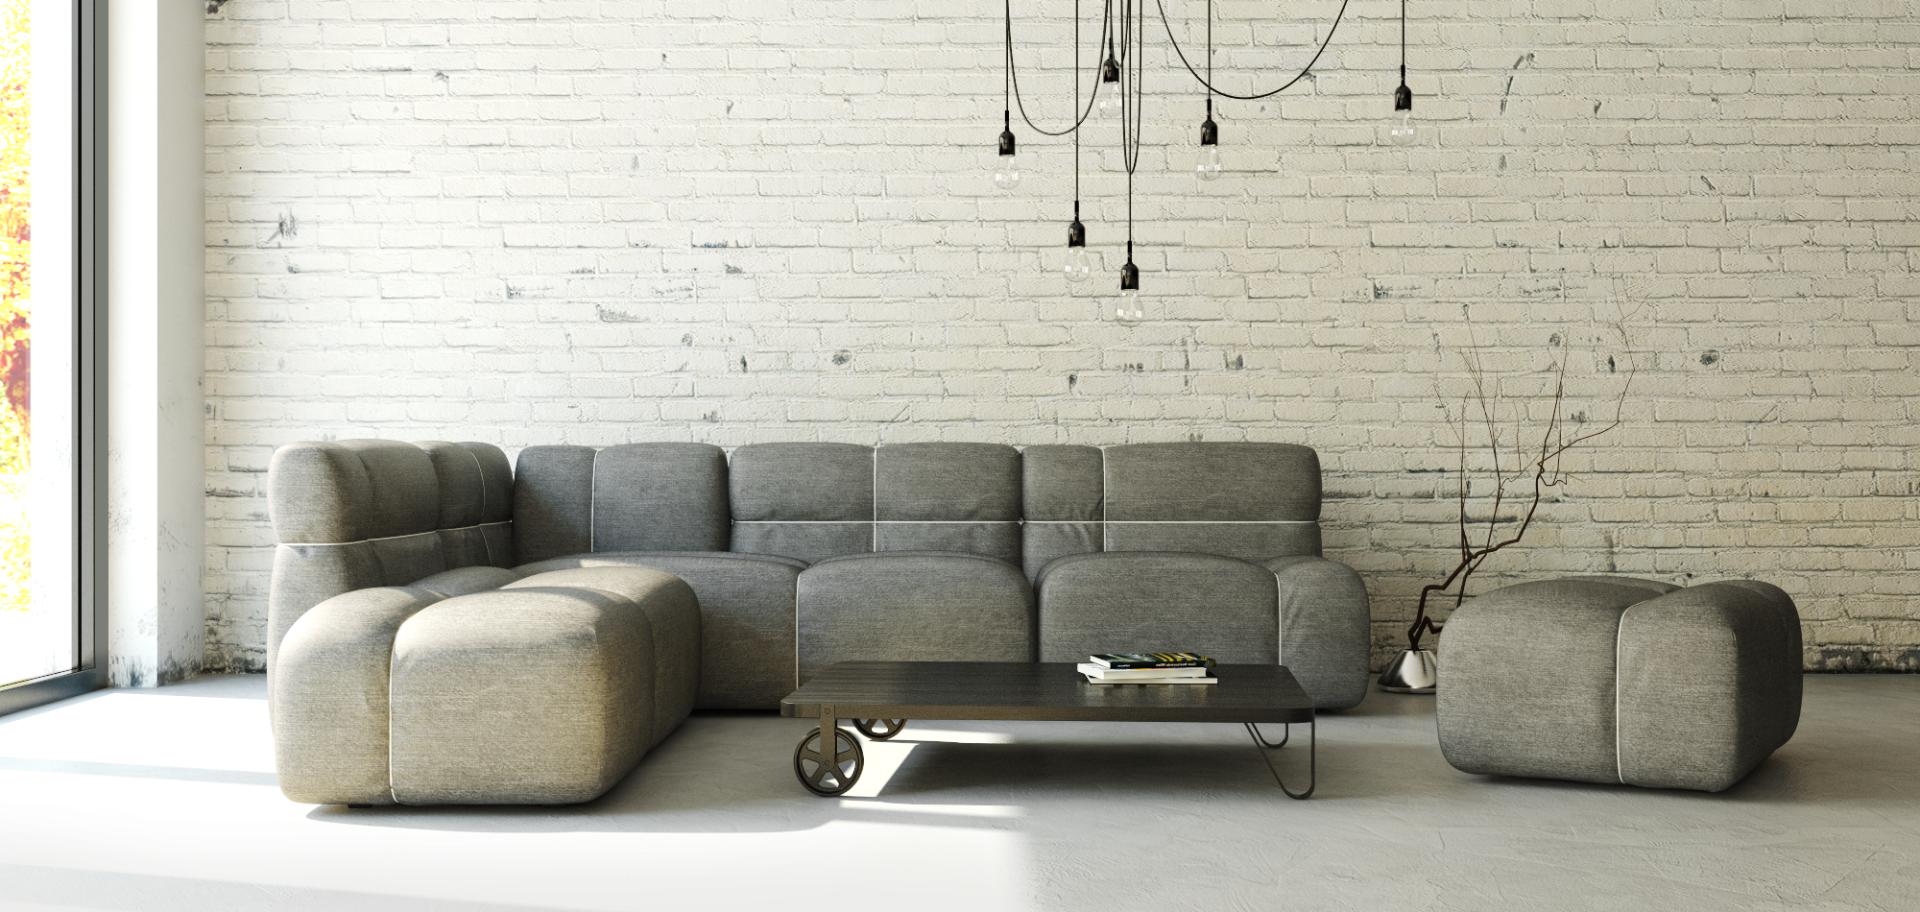 Package modular sofa by Boris Klimek | MMINTERIER | Furnishings ...